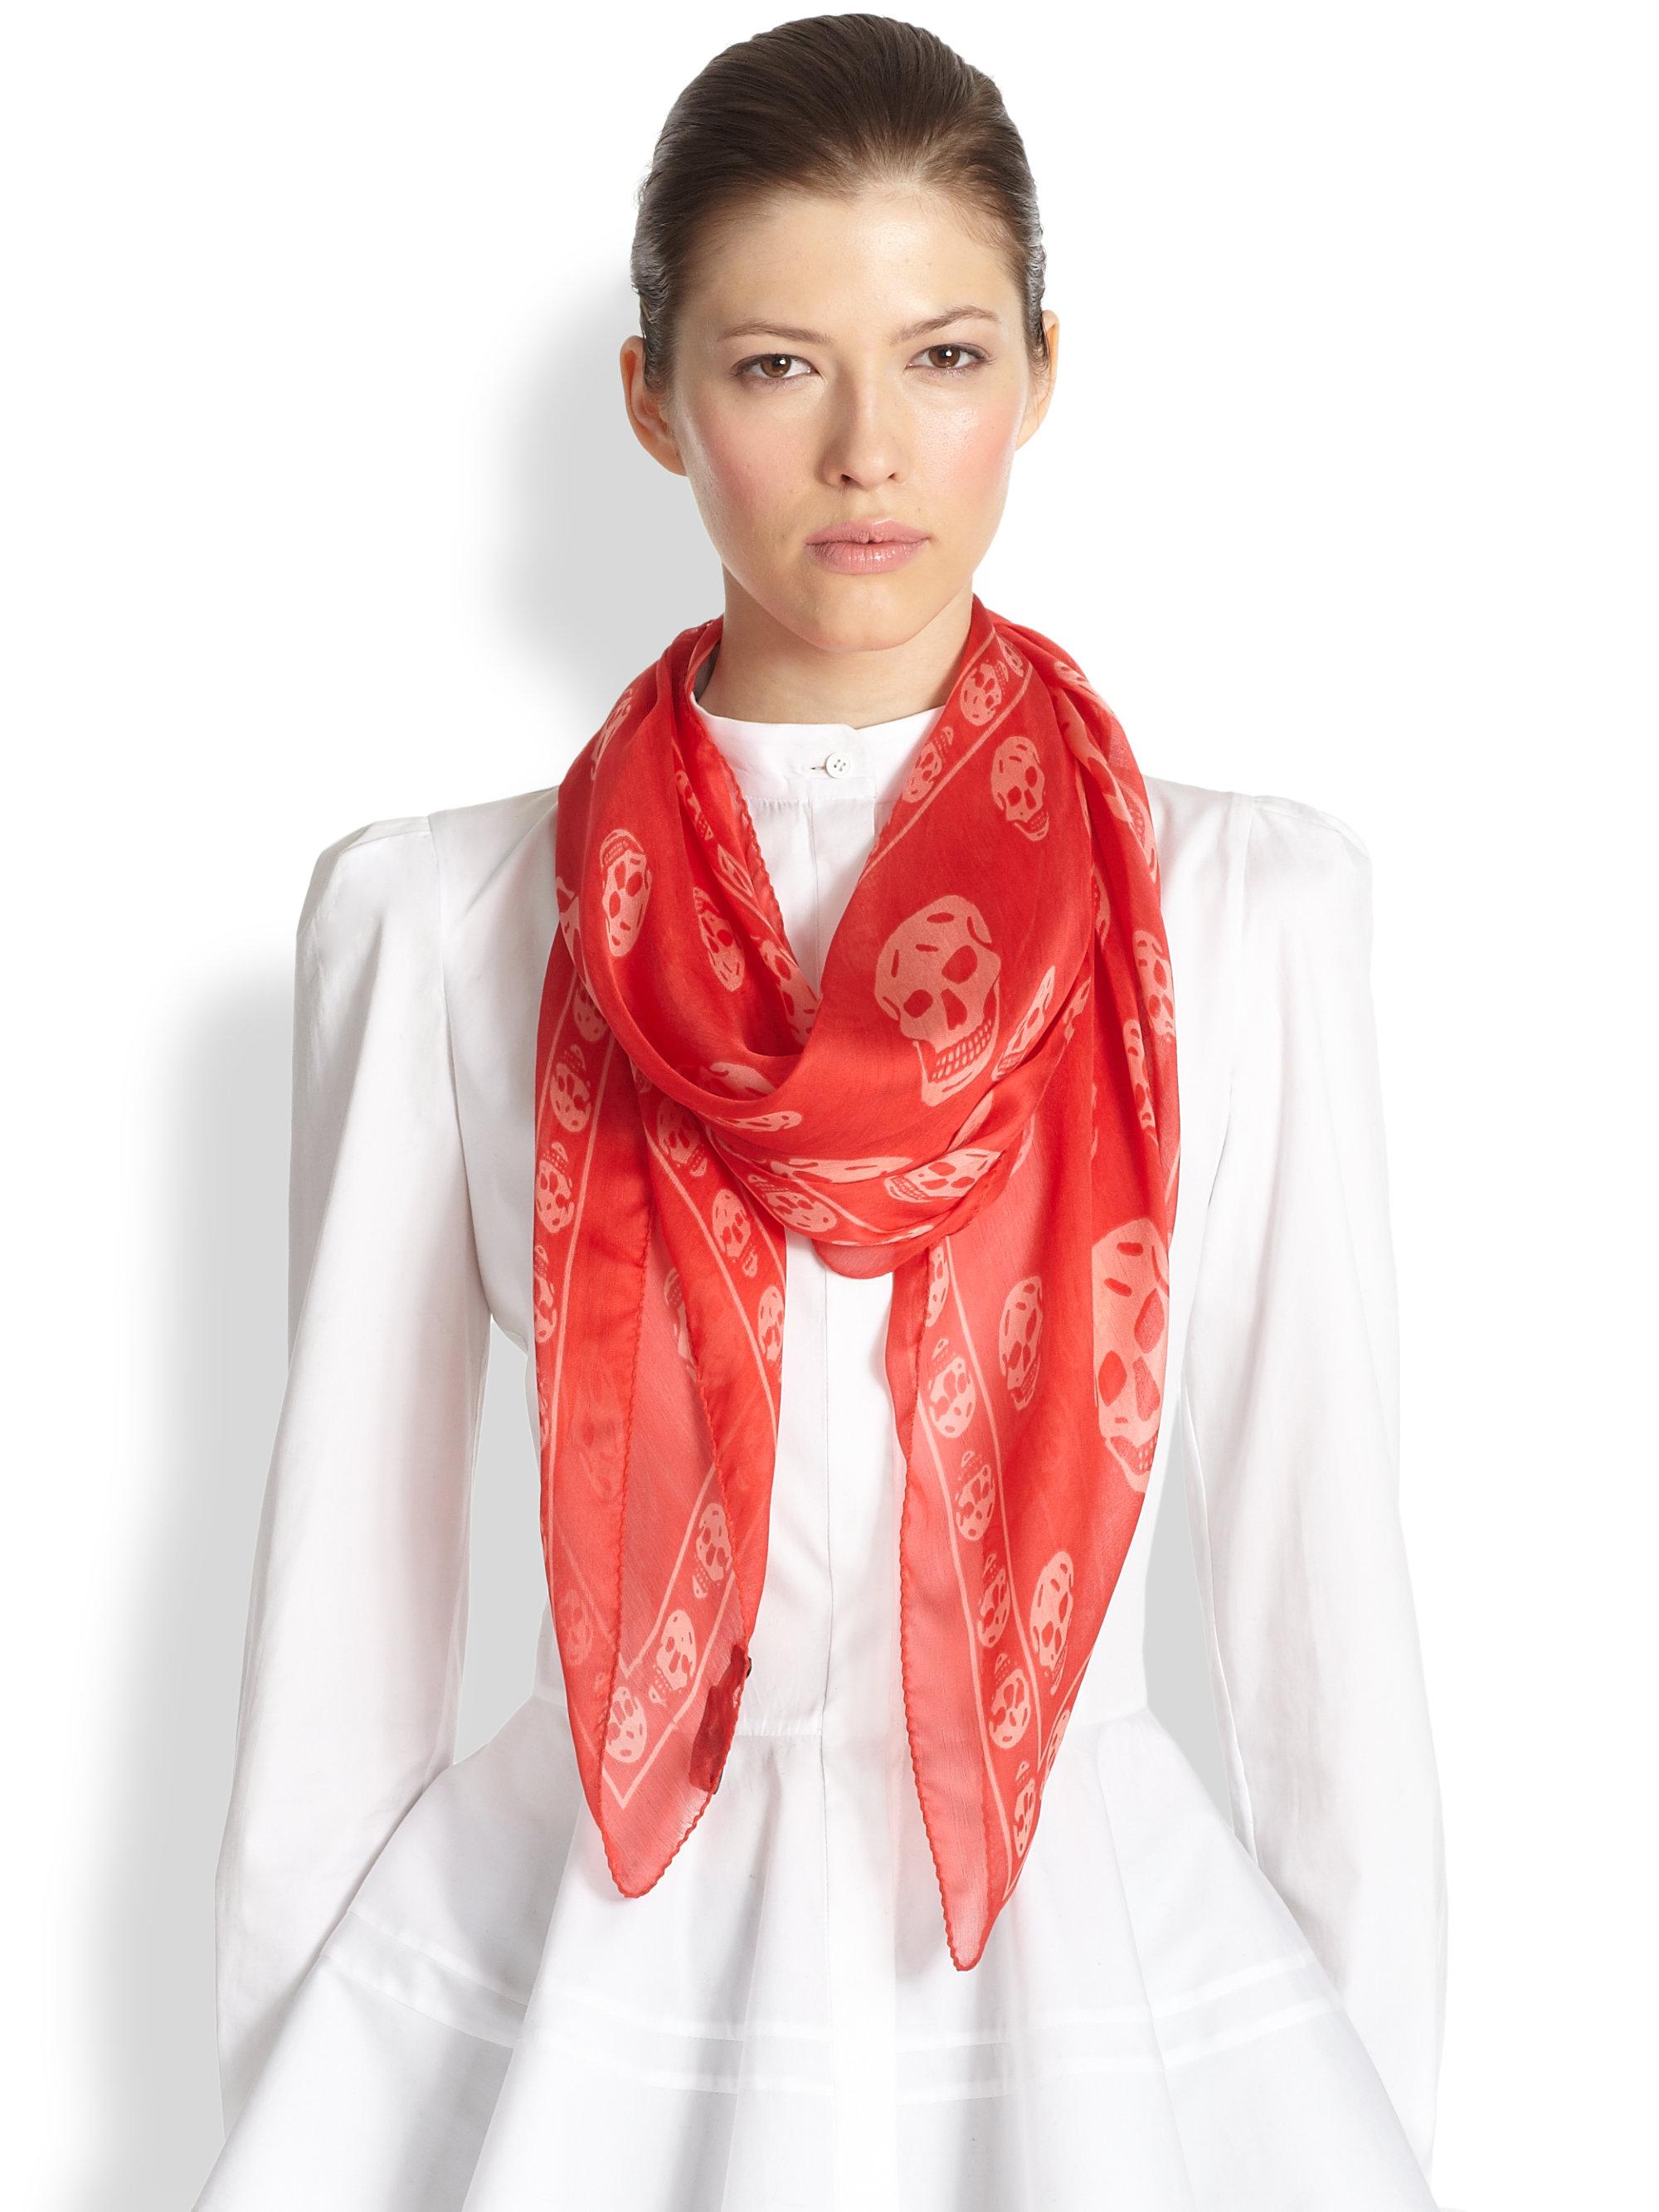 Lyst - Alexander mcqueen Silk Chiffon Skull Scarf in Red